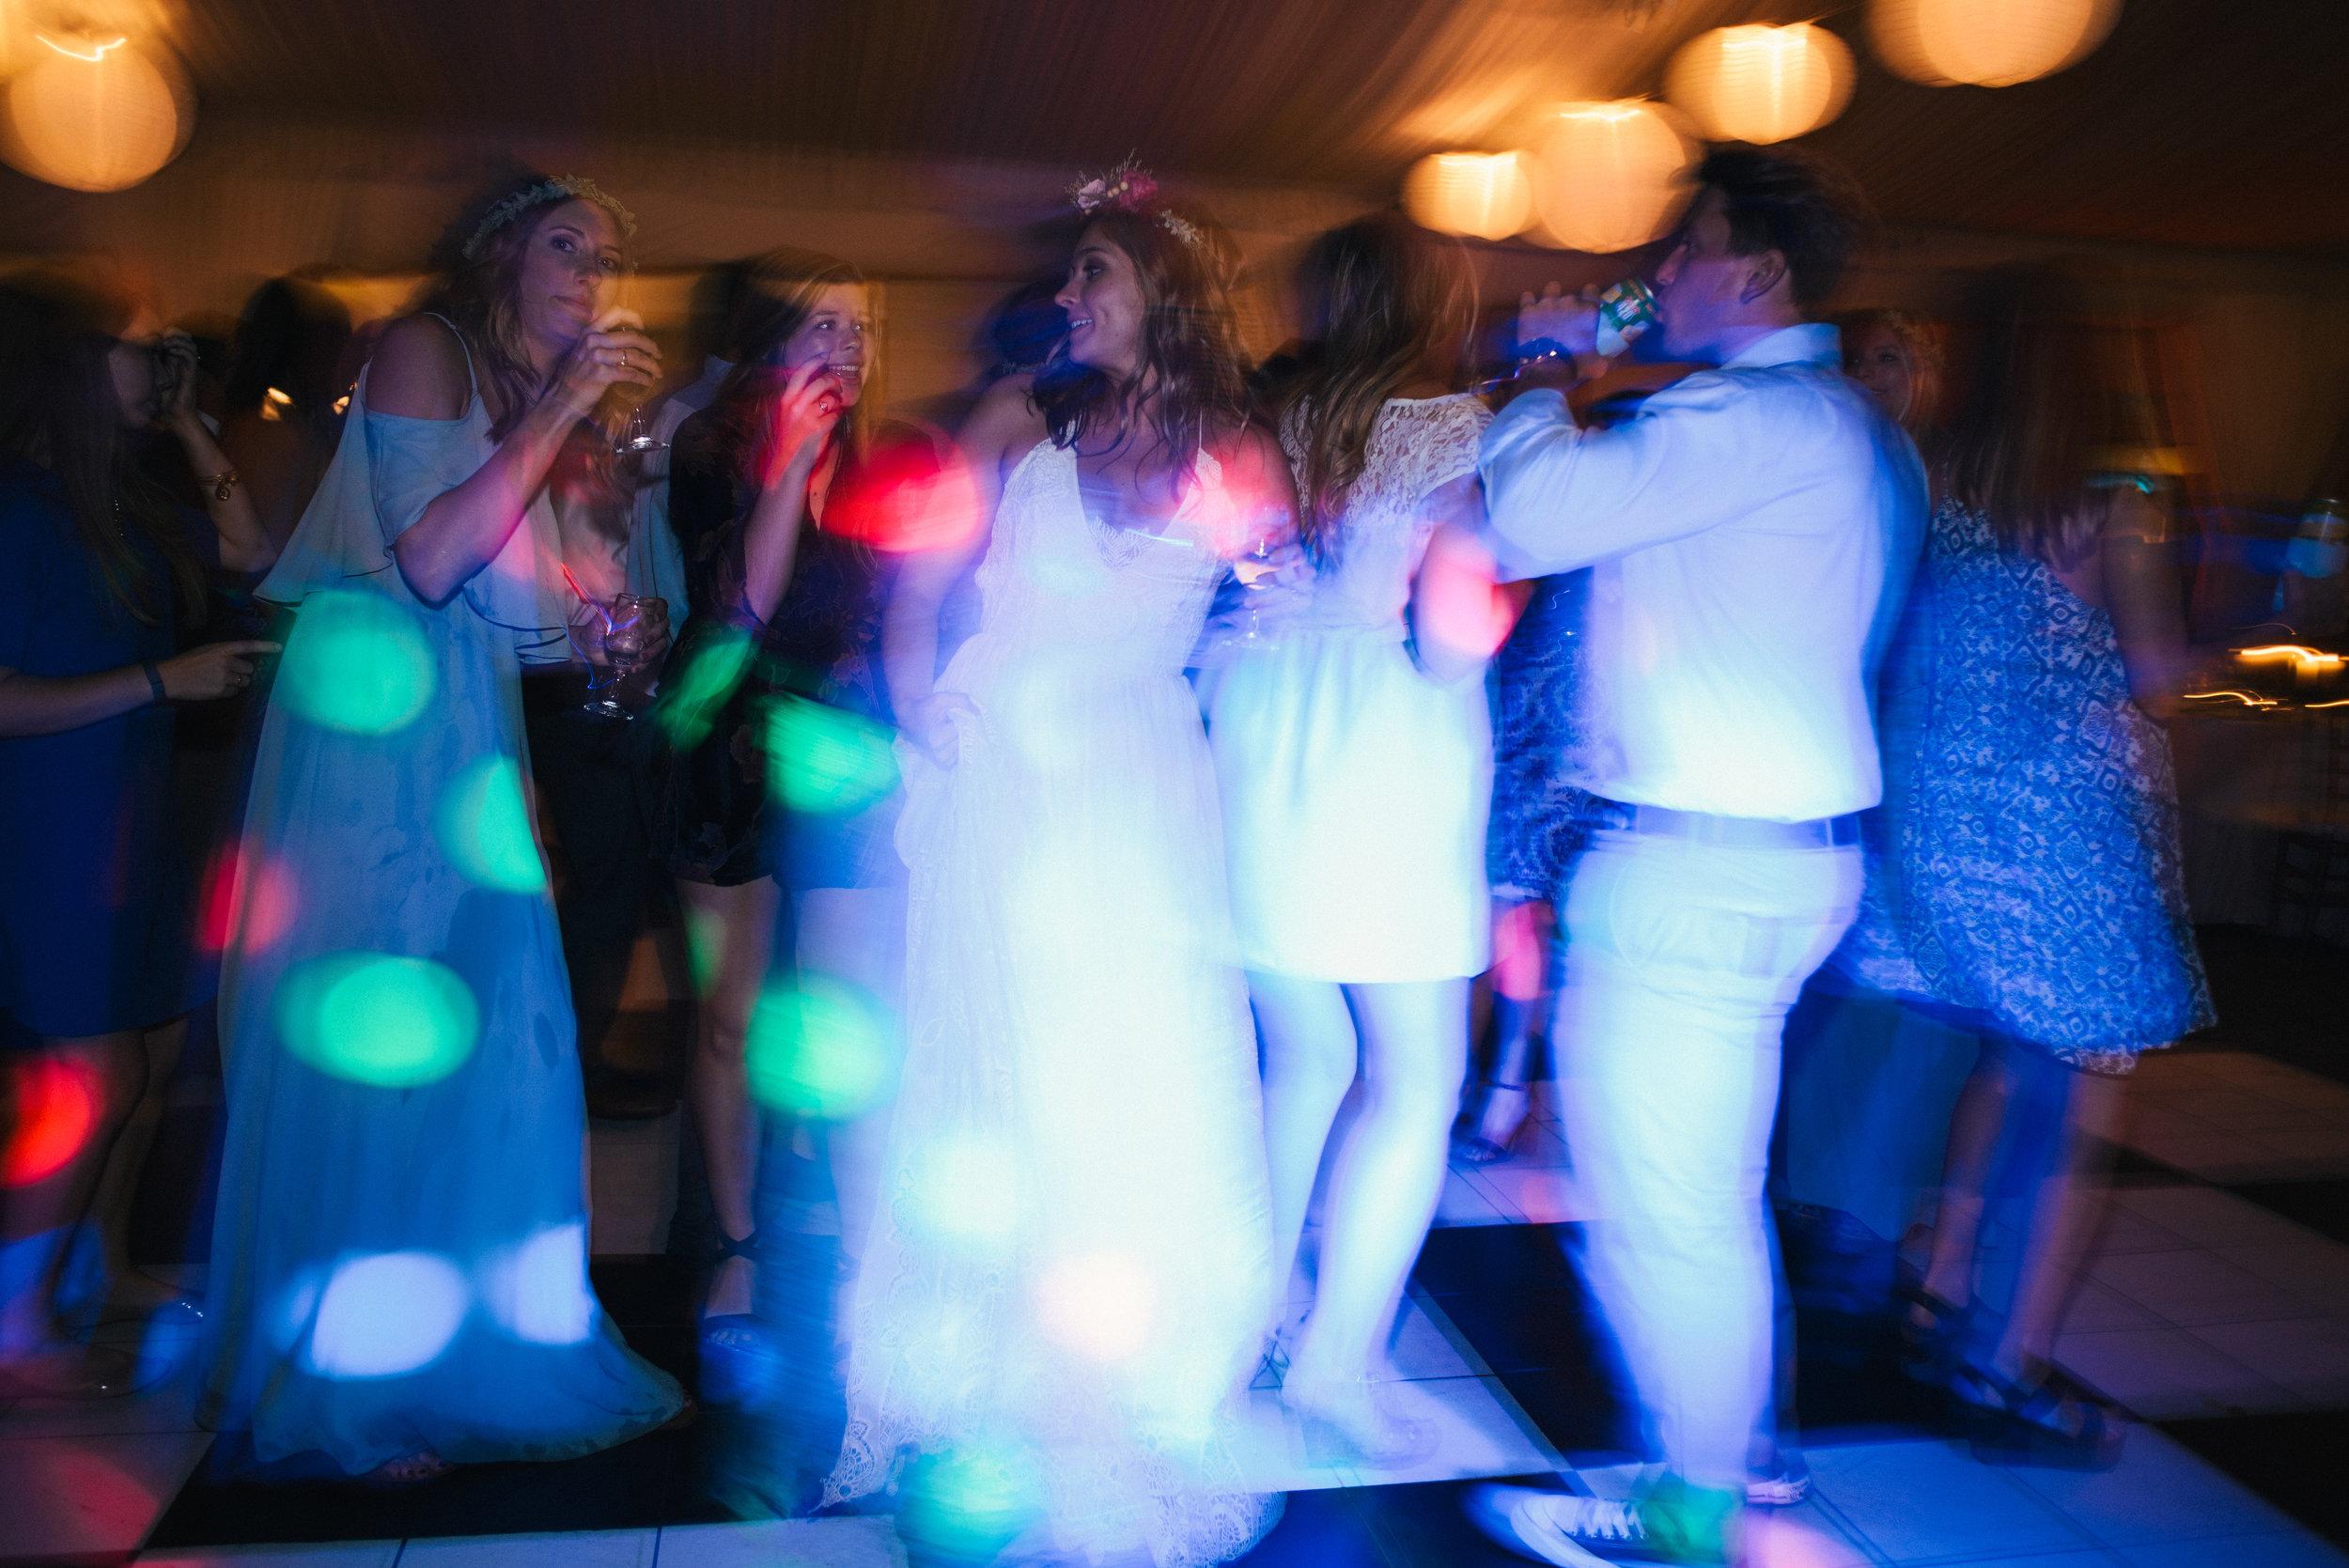 kristin-and-peter-atlanta-georgia-wedding-october-8th-2016 (828 of 1068).jpg